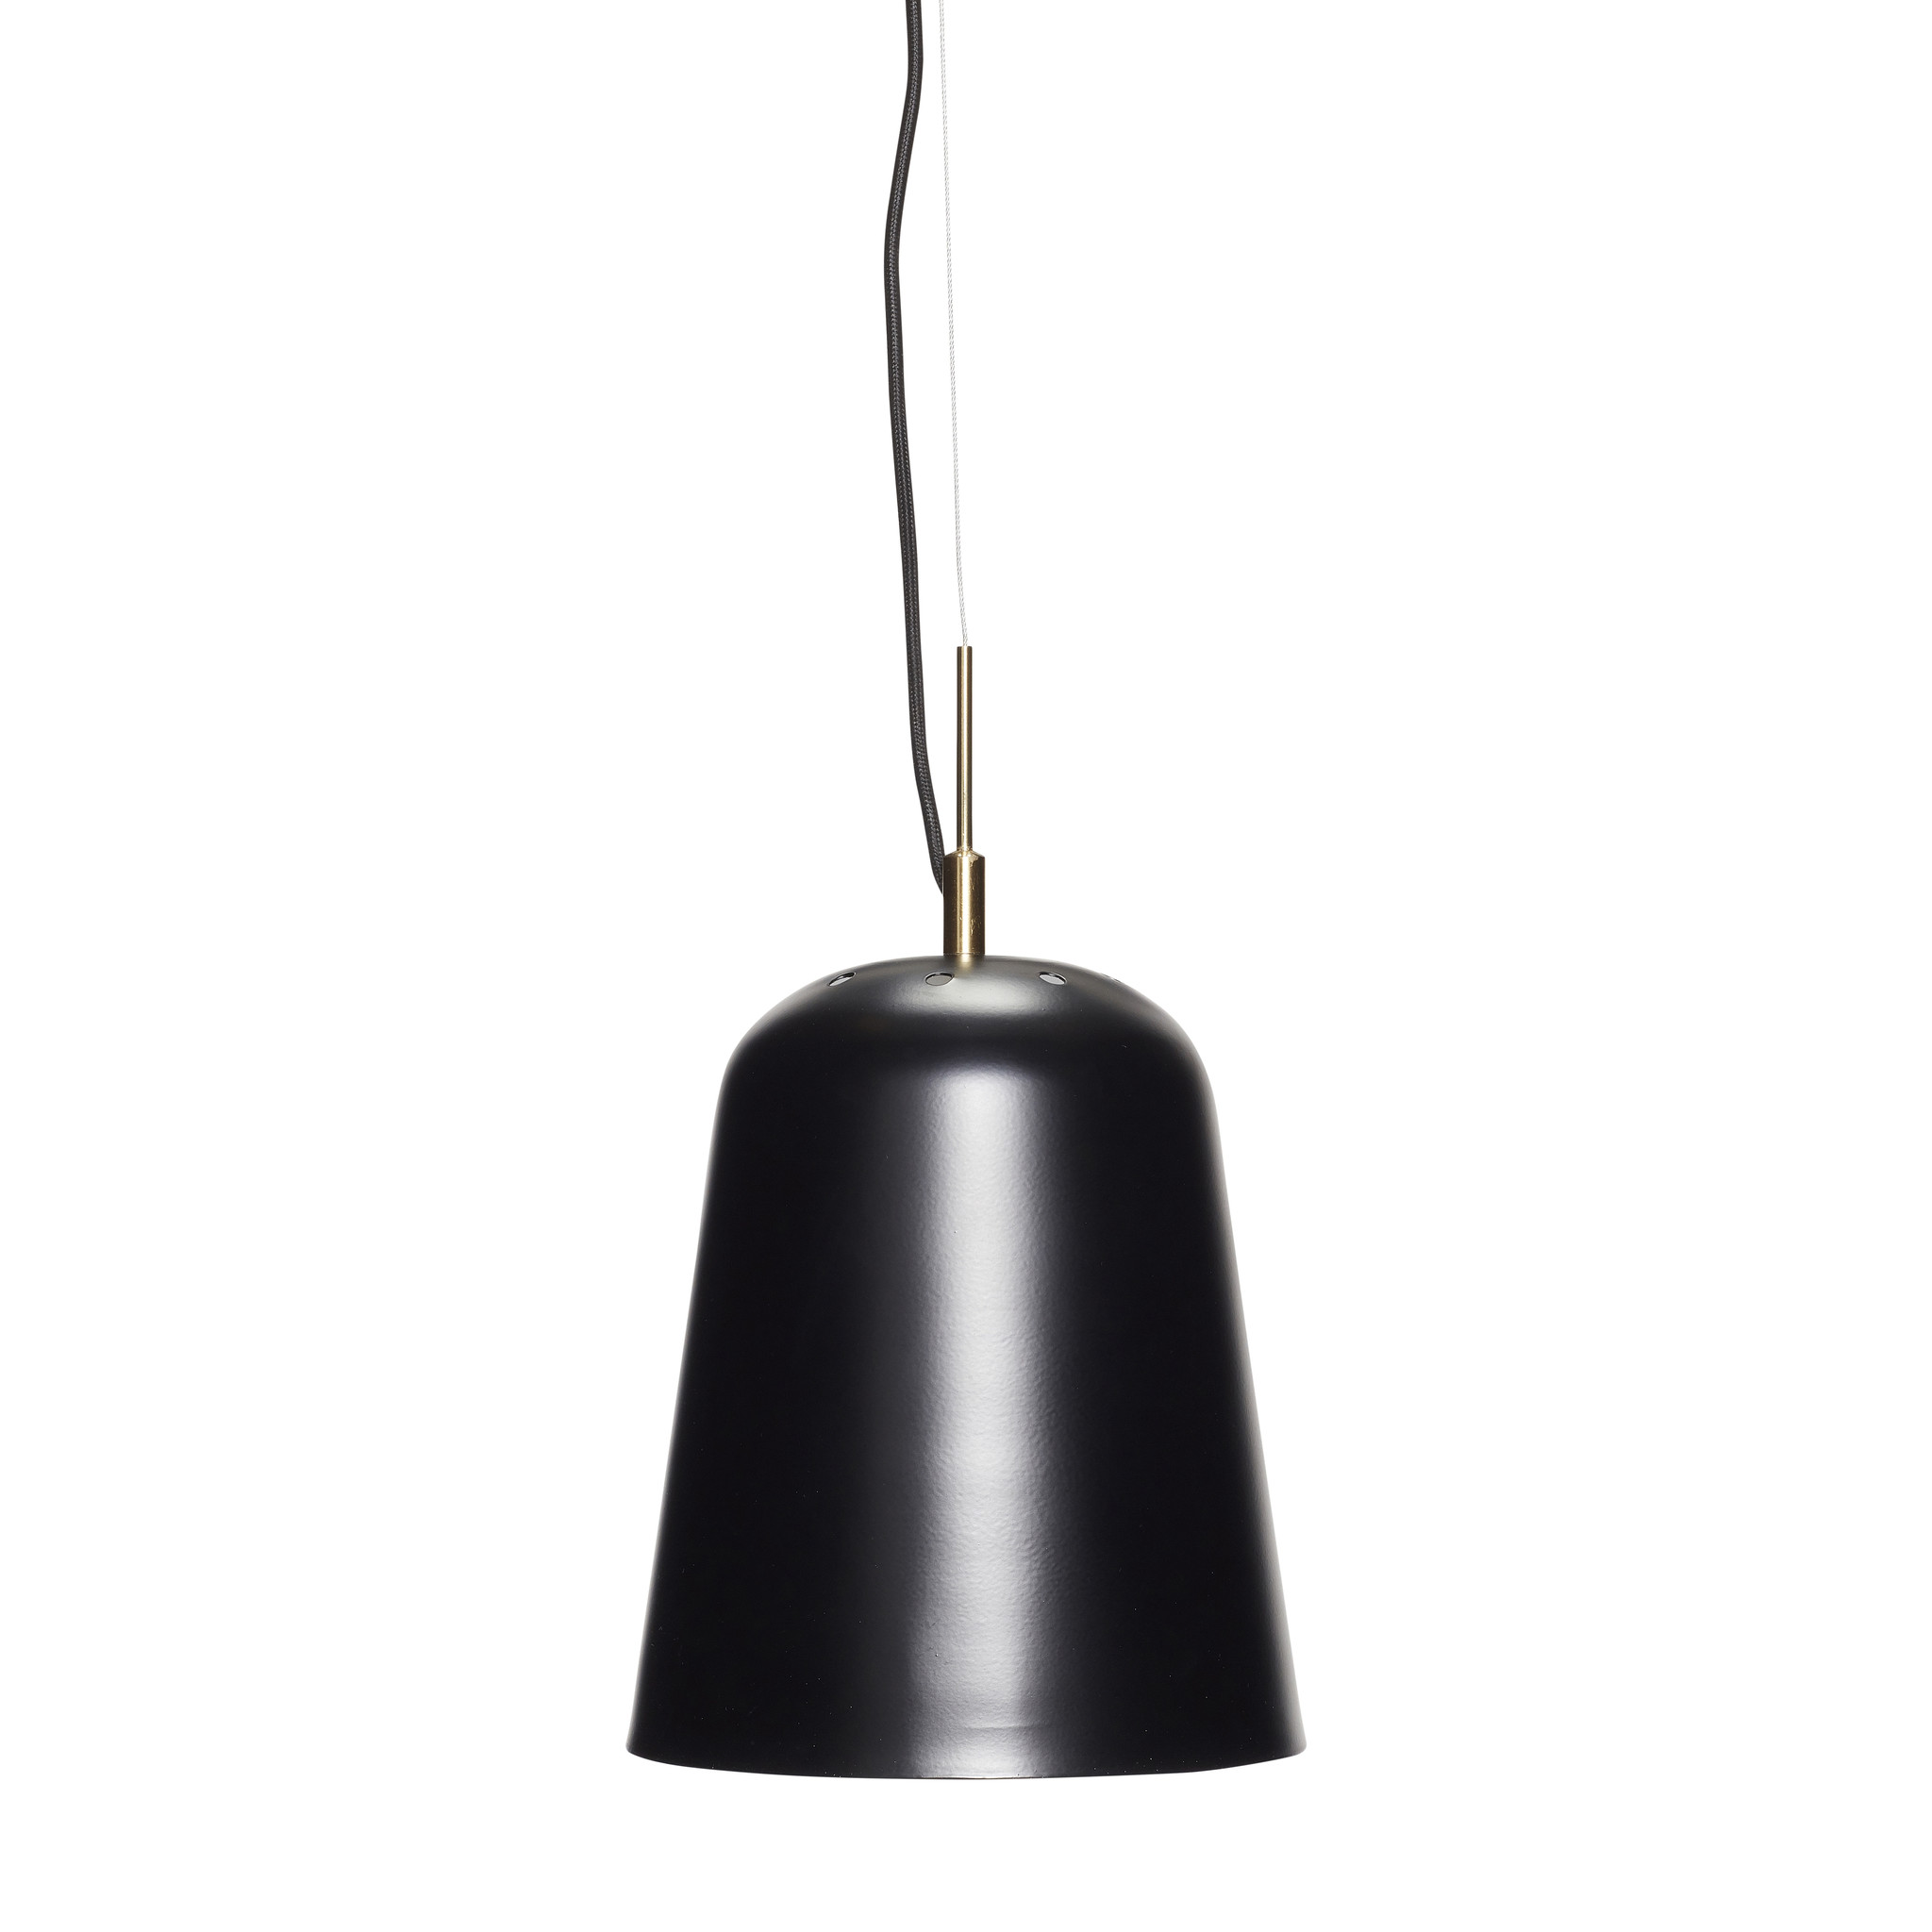 Hubsch Lamp, metaal, zwart-990609-5712772063811